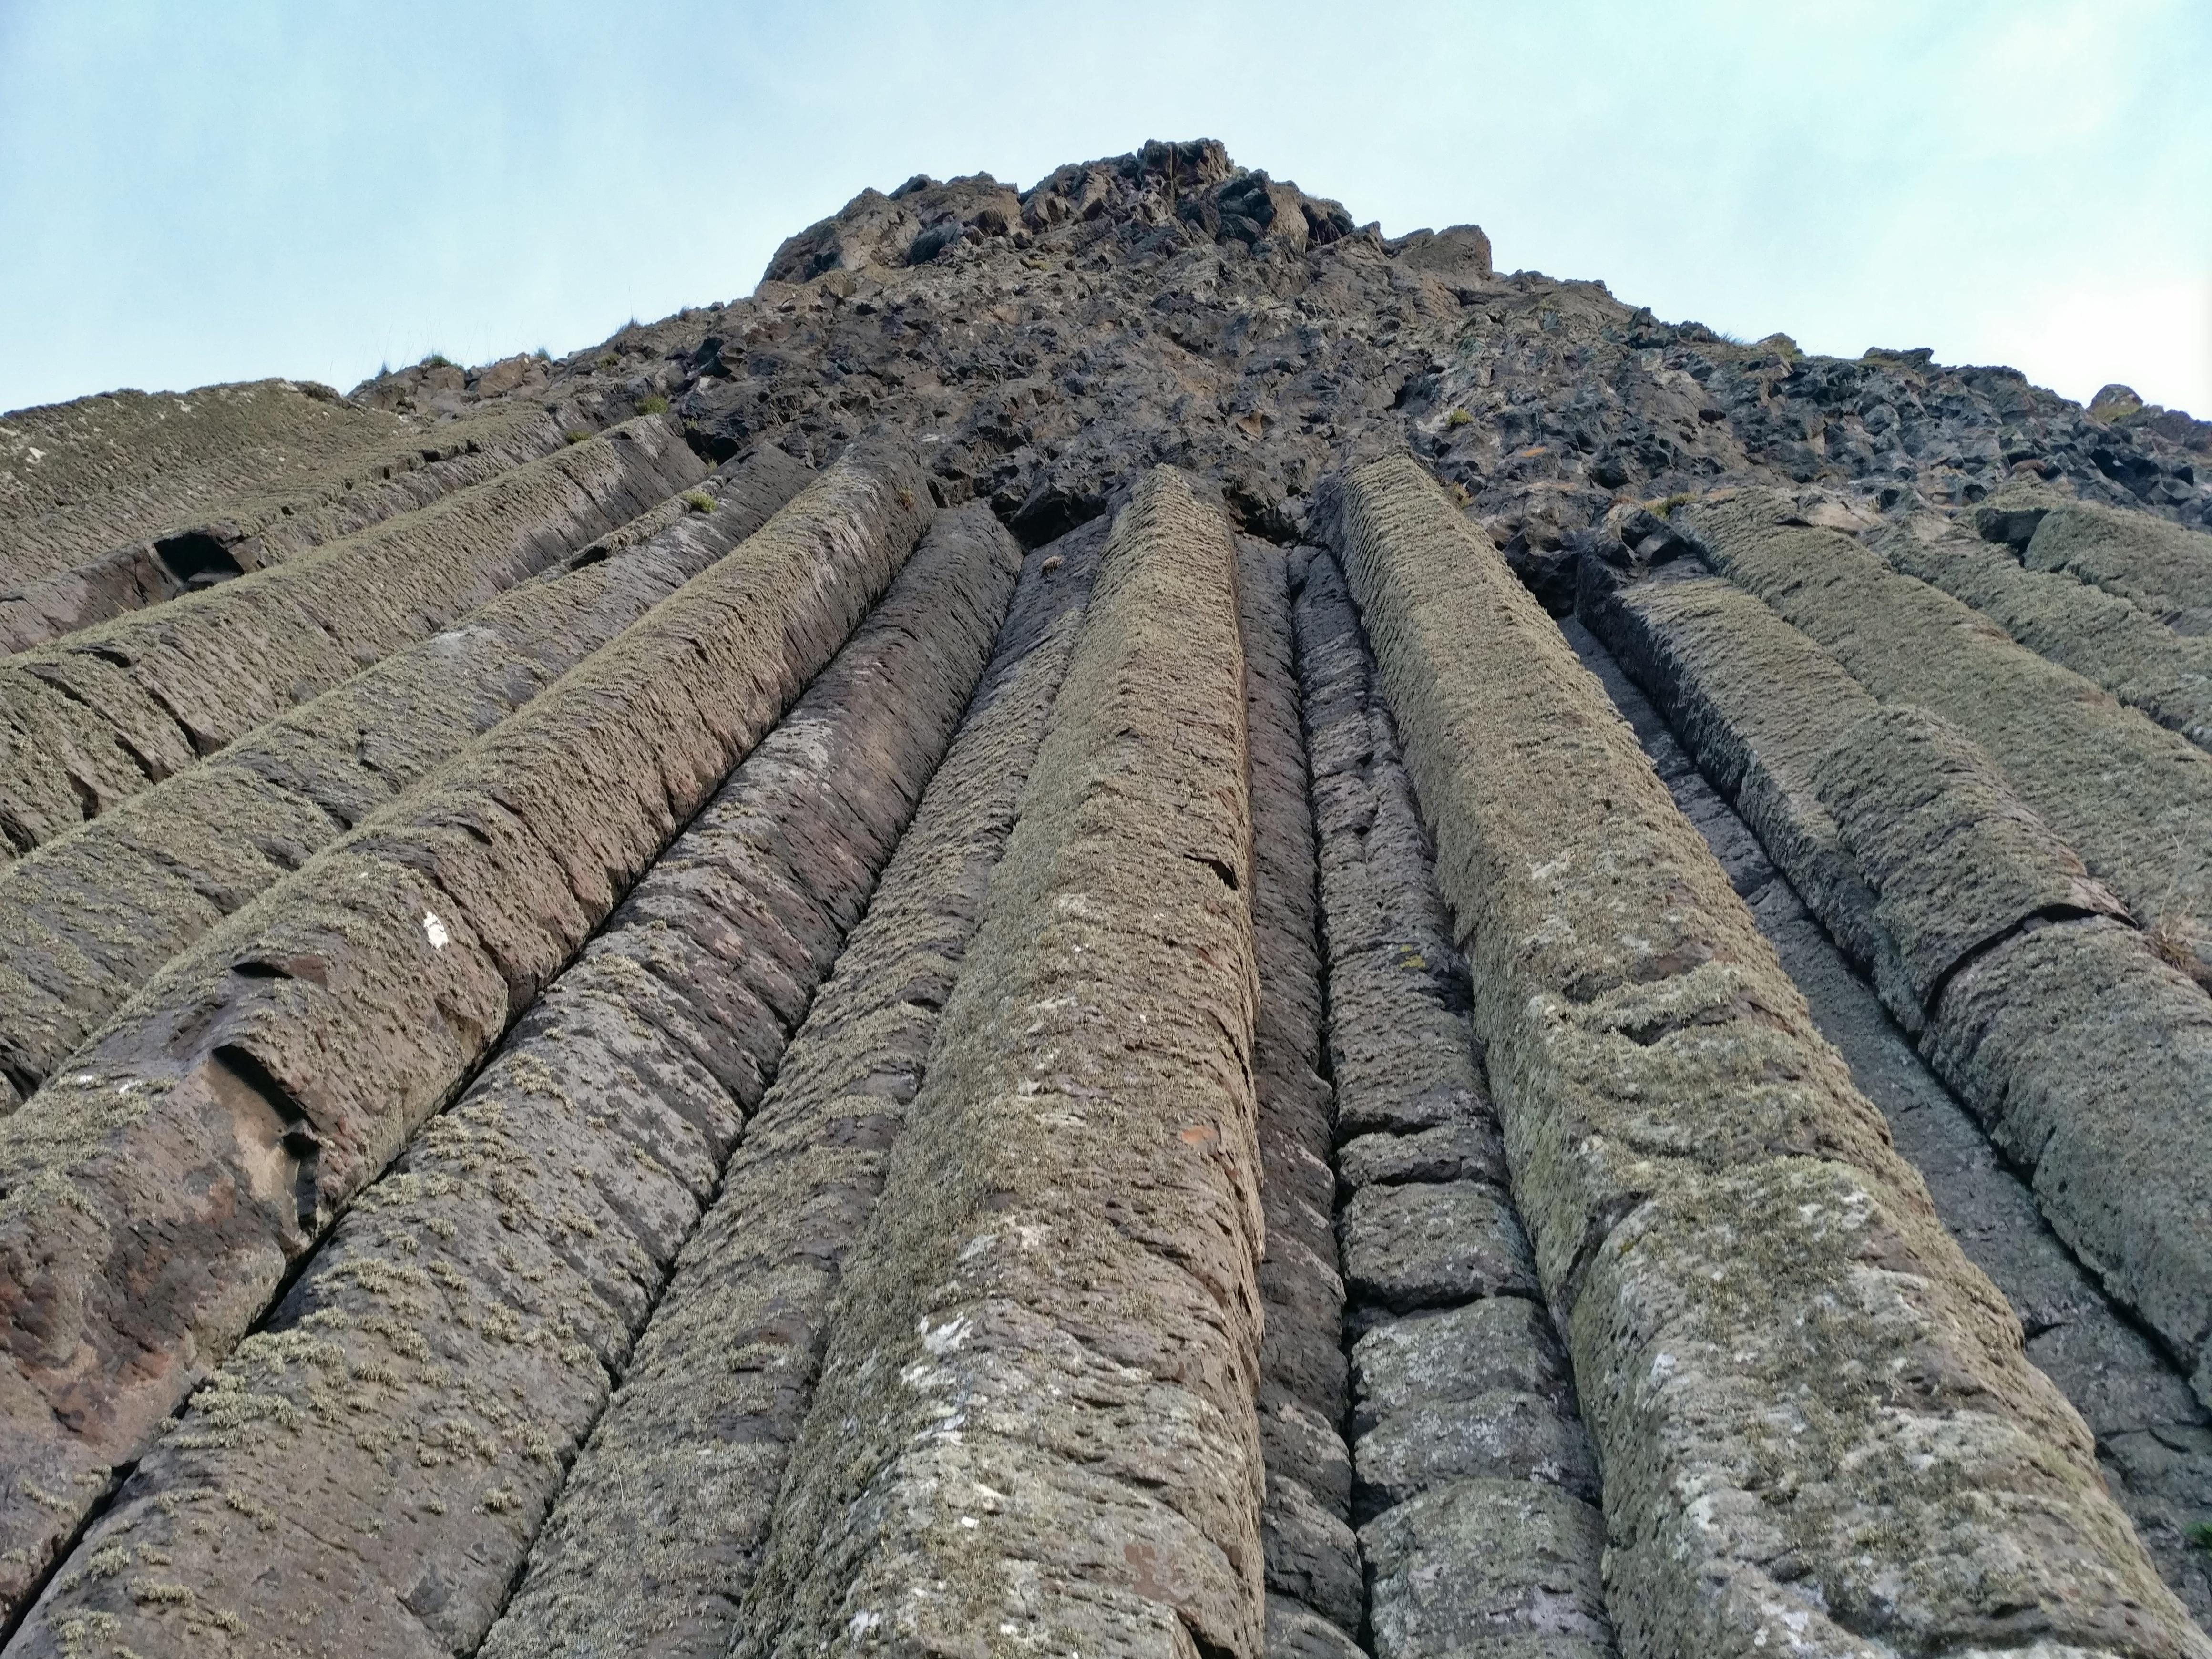 трудно представить, базальт фото камня сердца замке выглядят